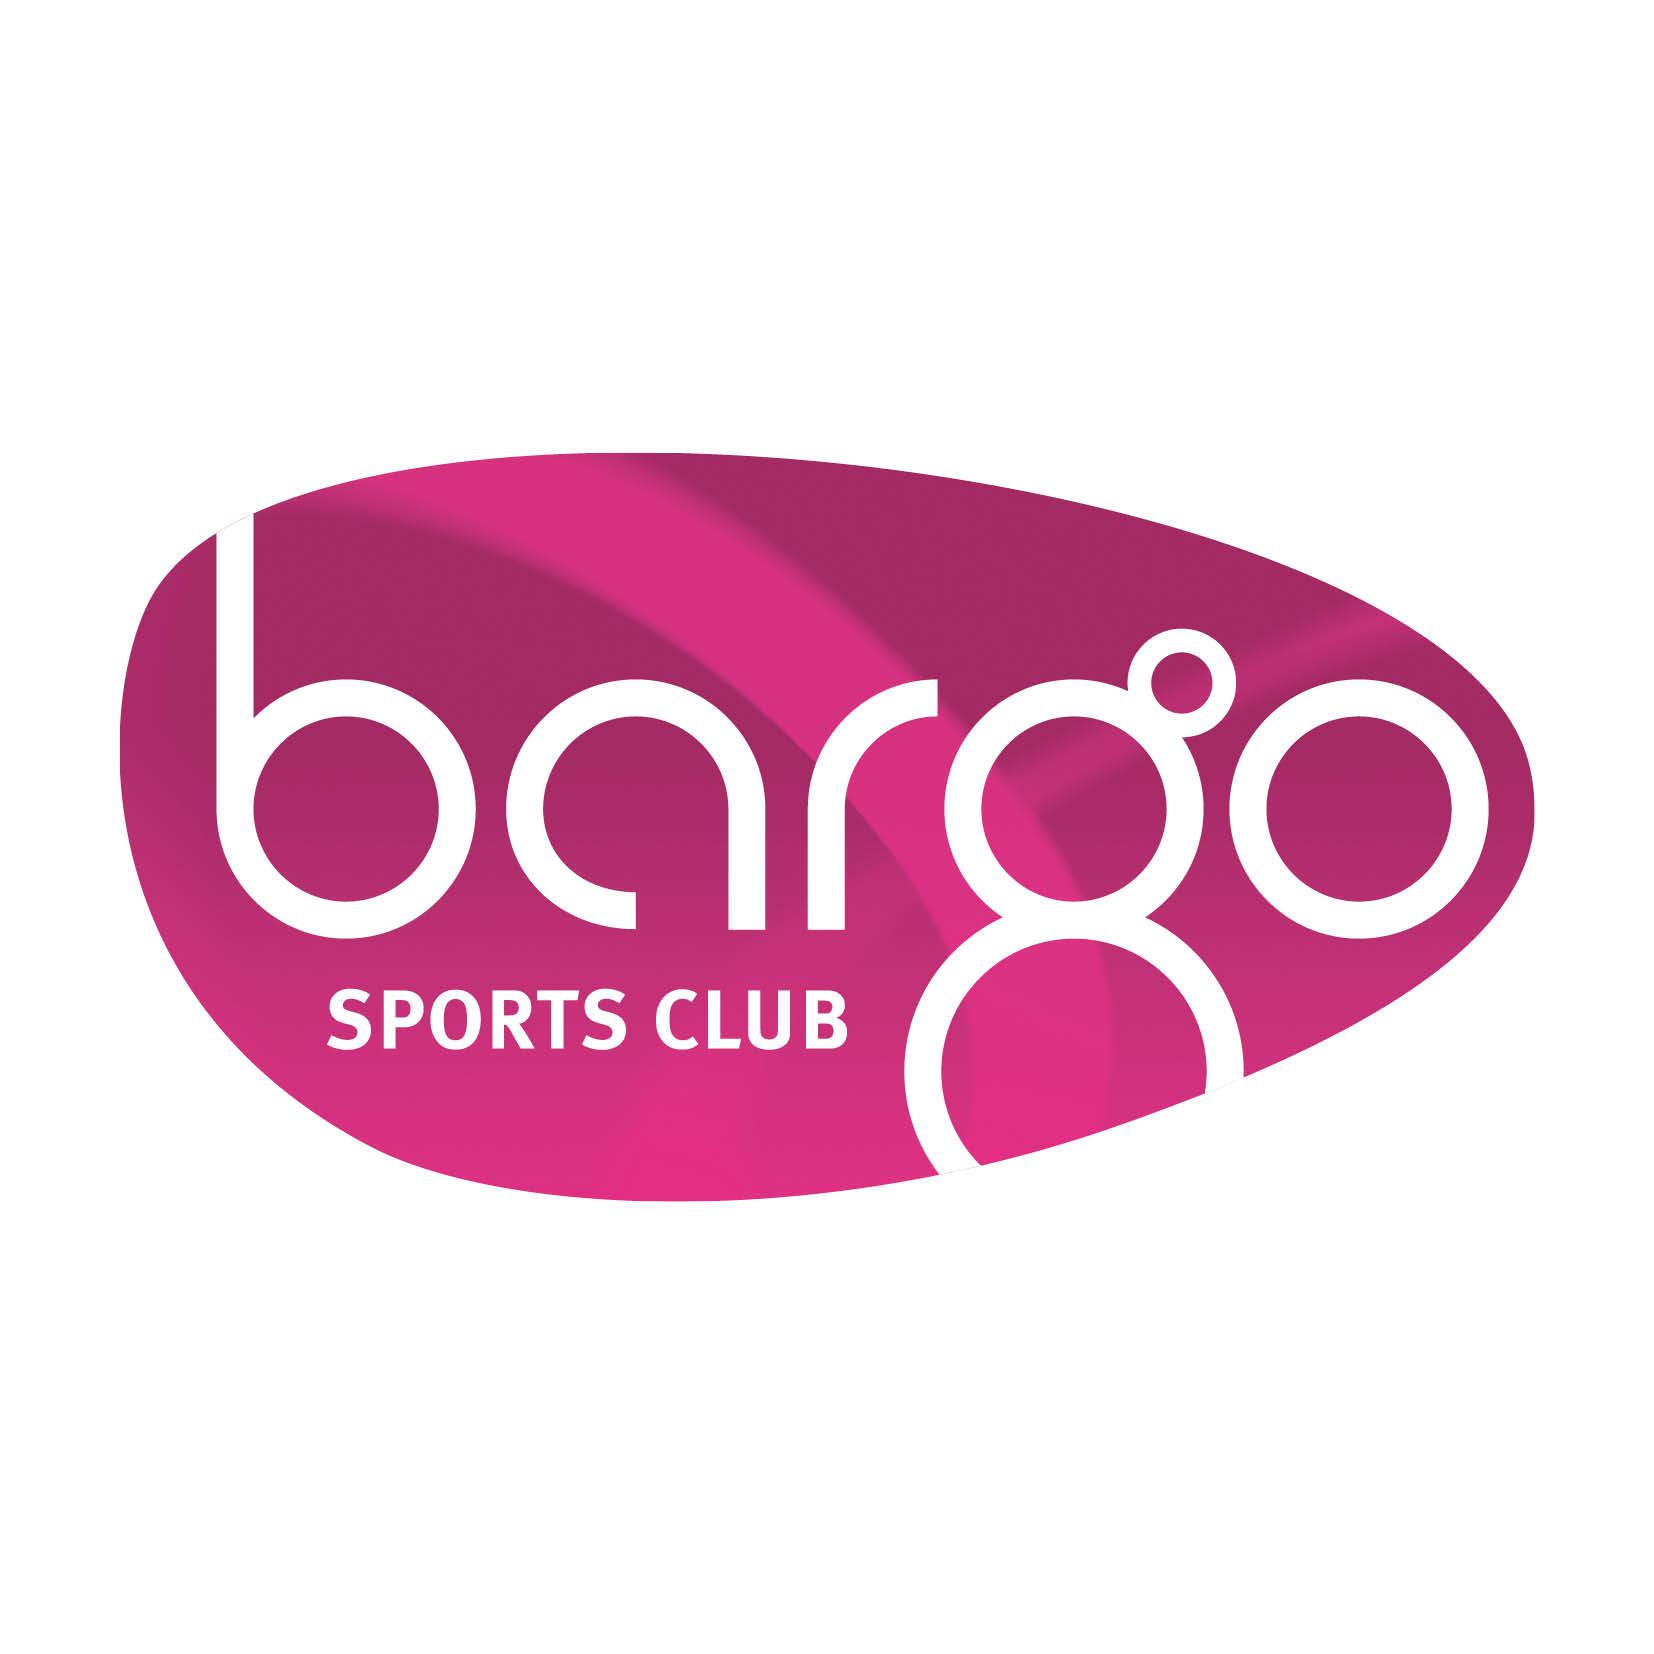 bargo logo